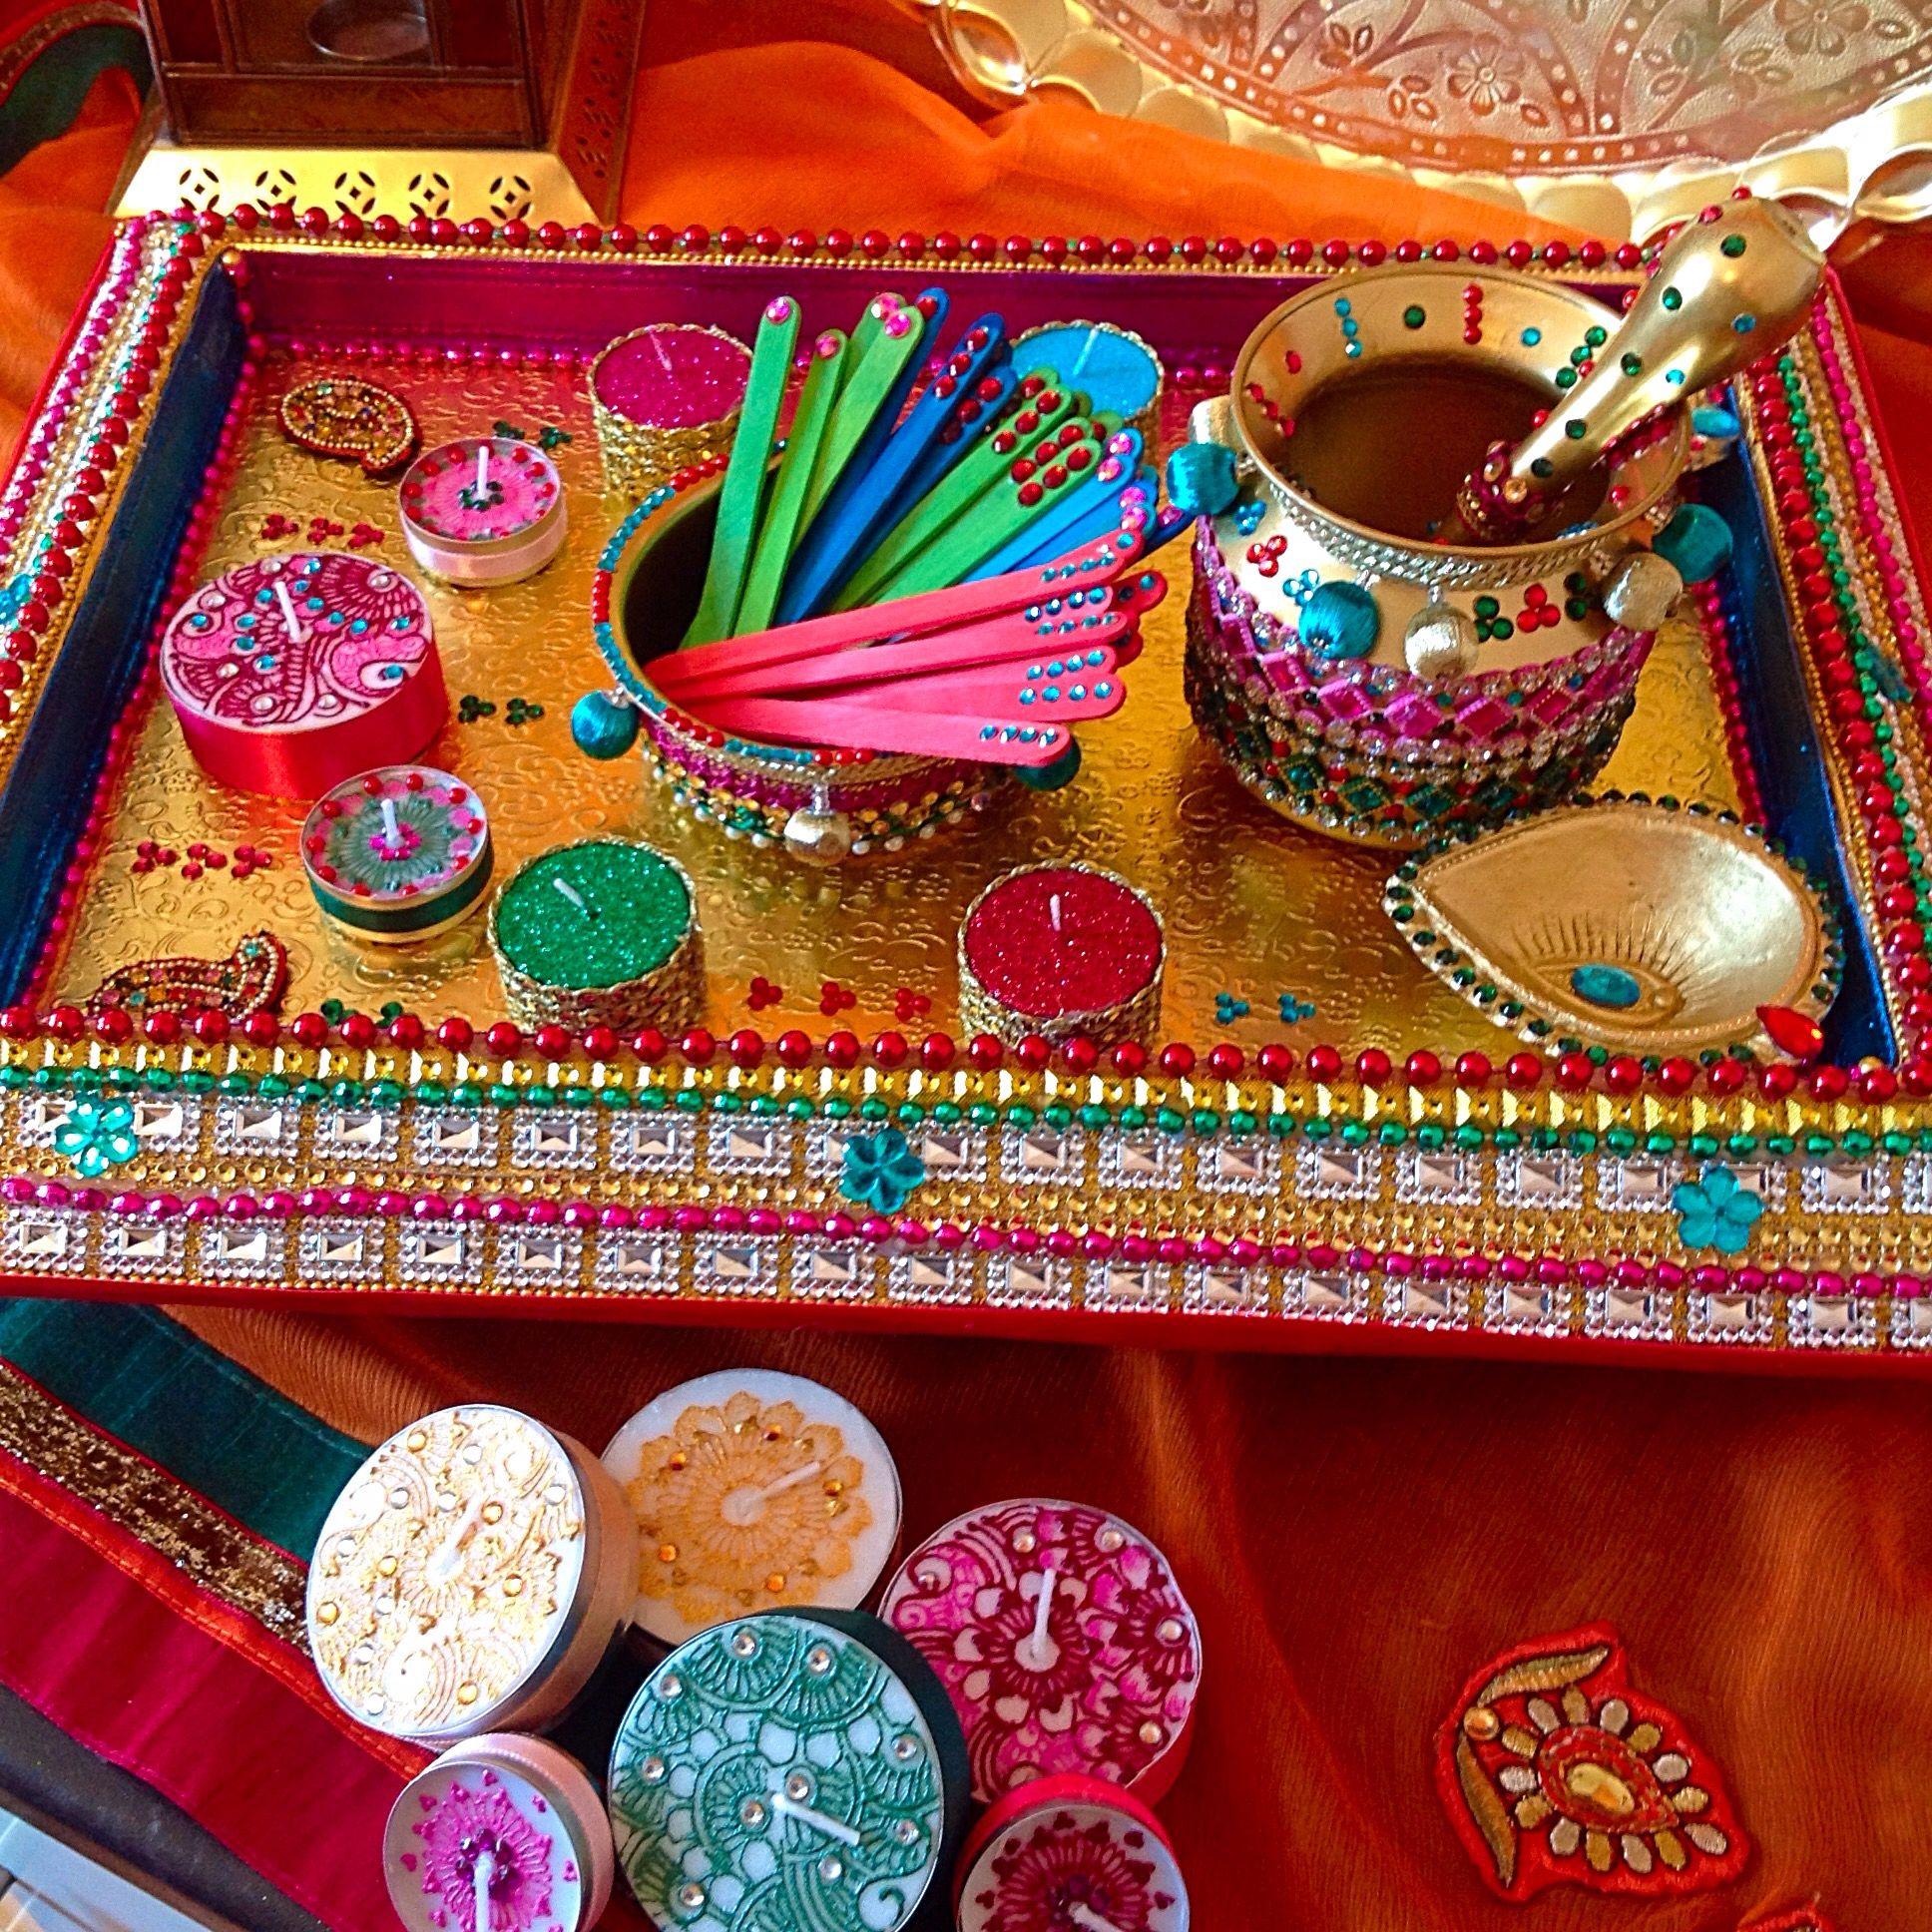 Mehndi Decor Supplies : Large rectangular mehndi plate with matching oil and